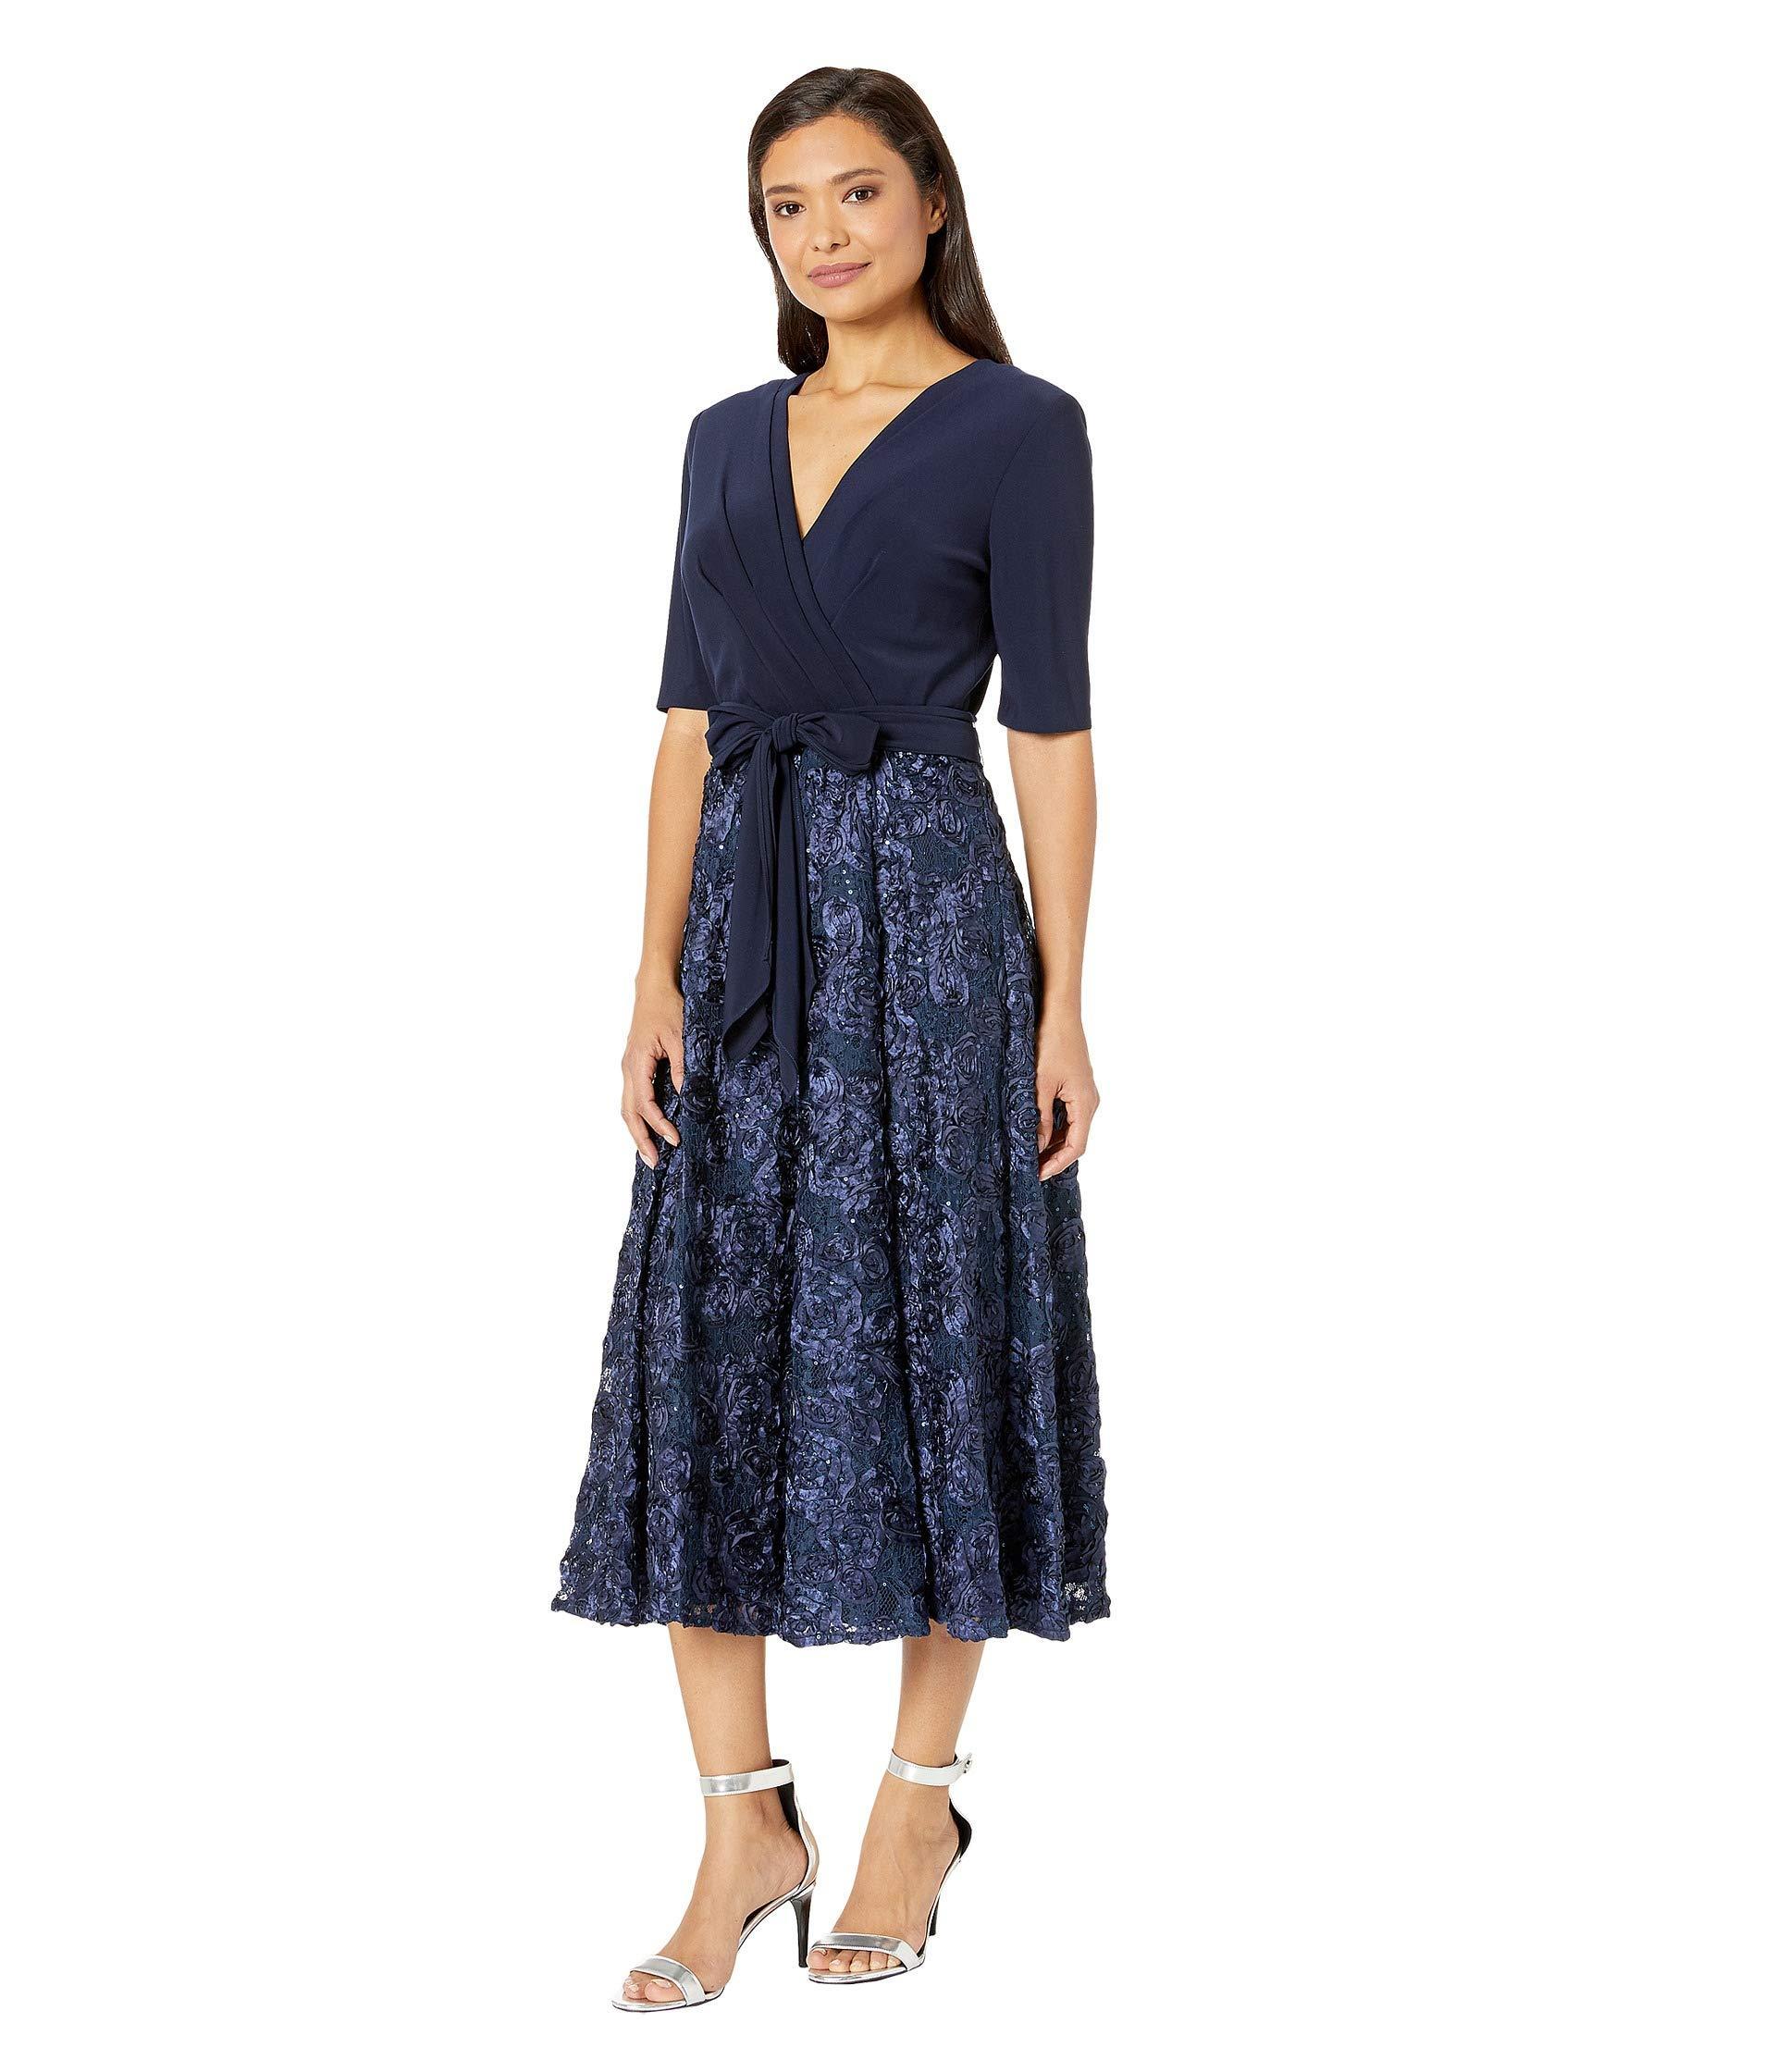 e2158dca4e7e Tap to visit site. Alex Evenings - Blue Tea Length Party Dress With Full  Rosette Skirt ...